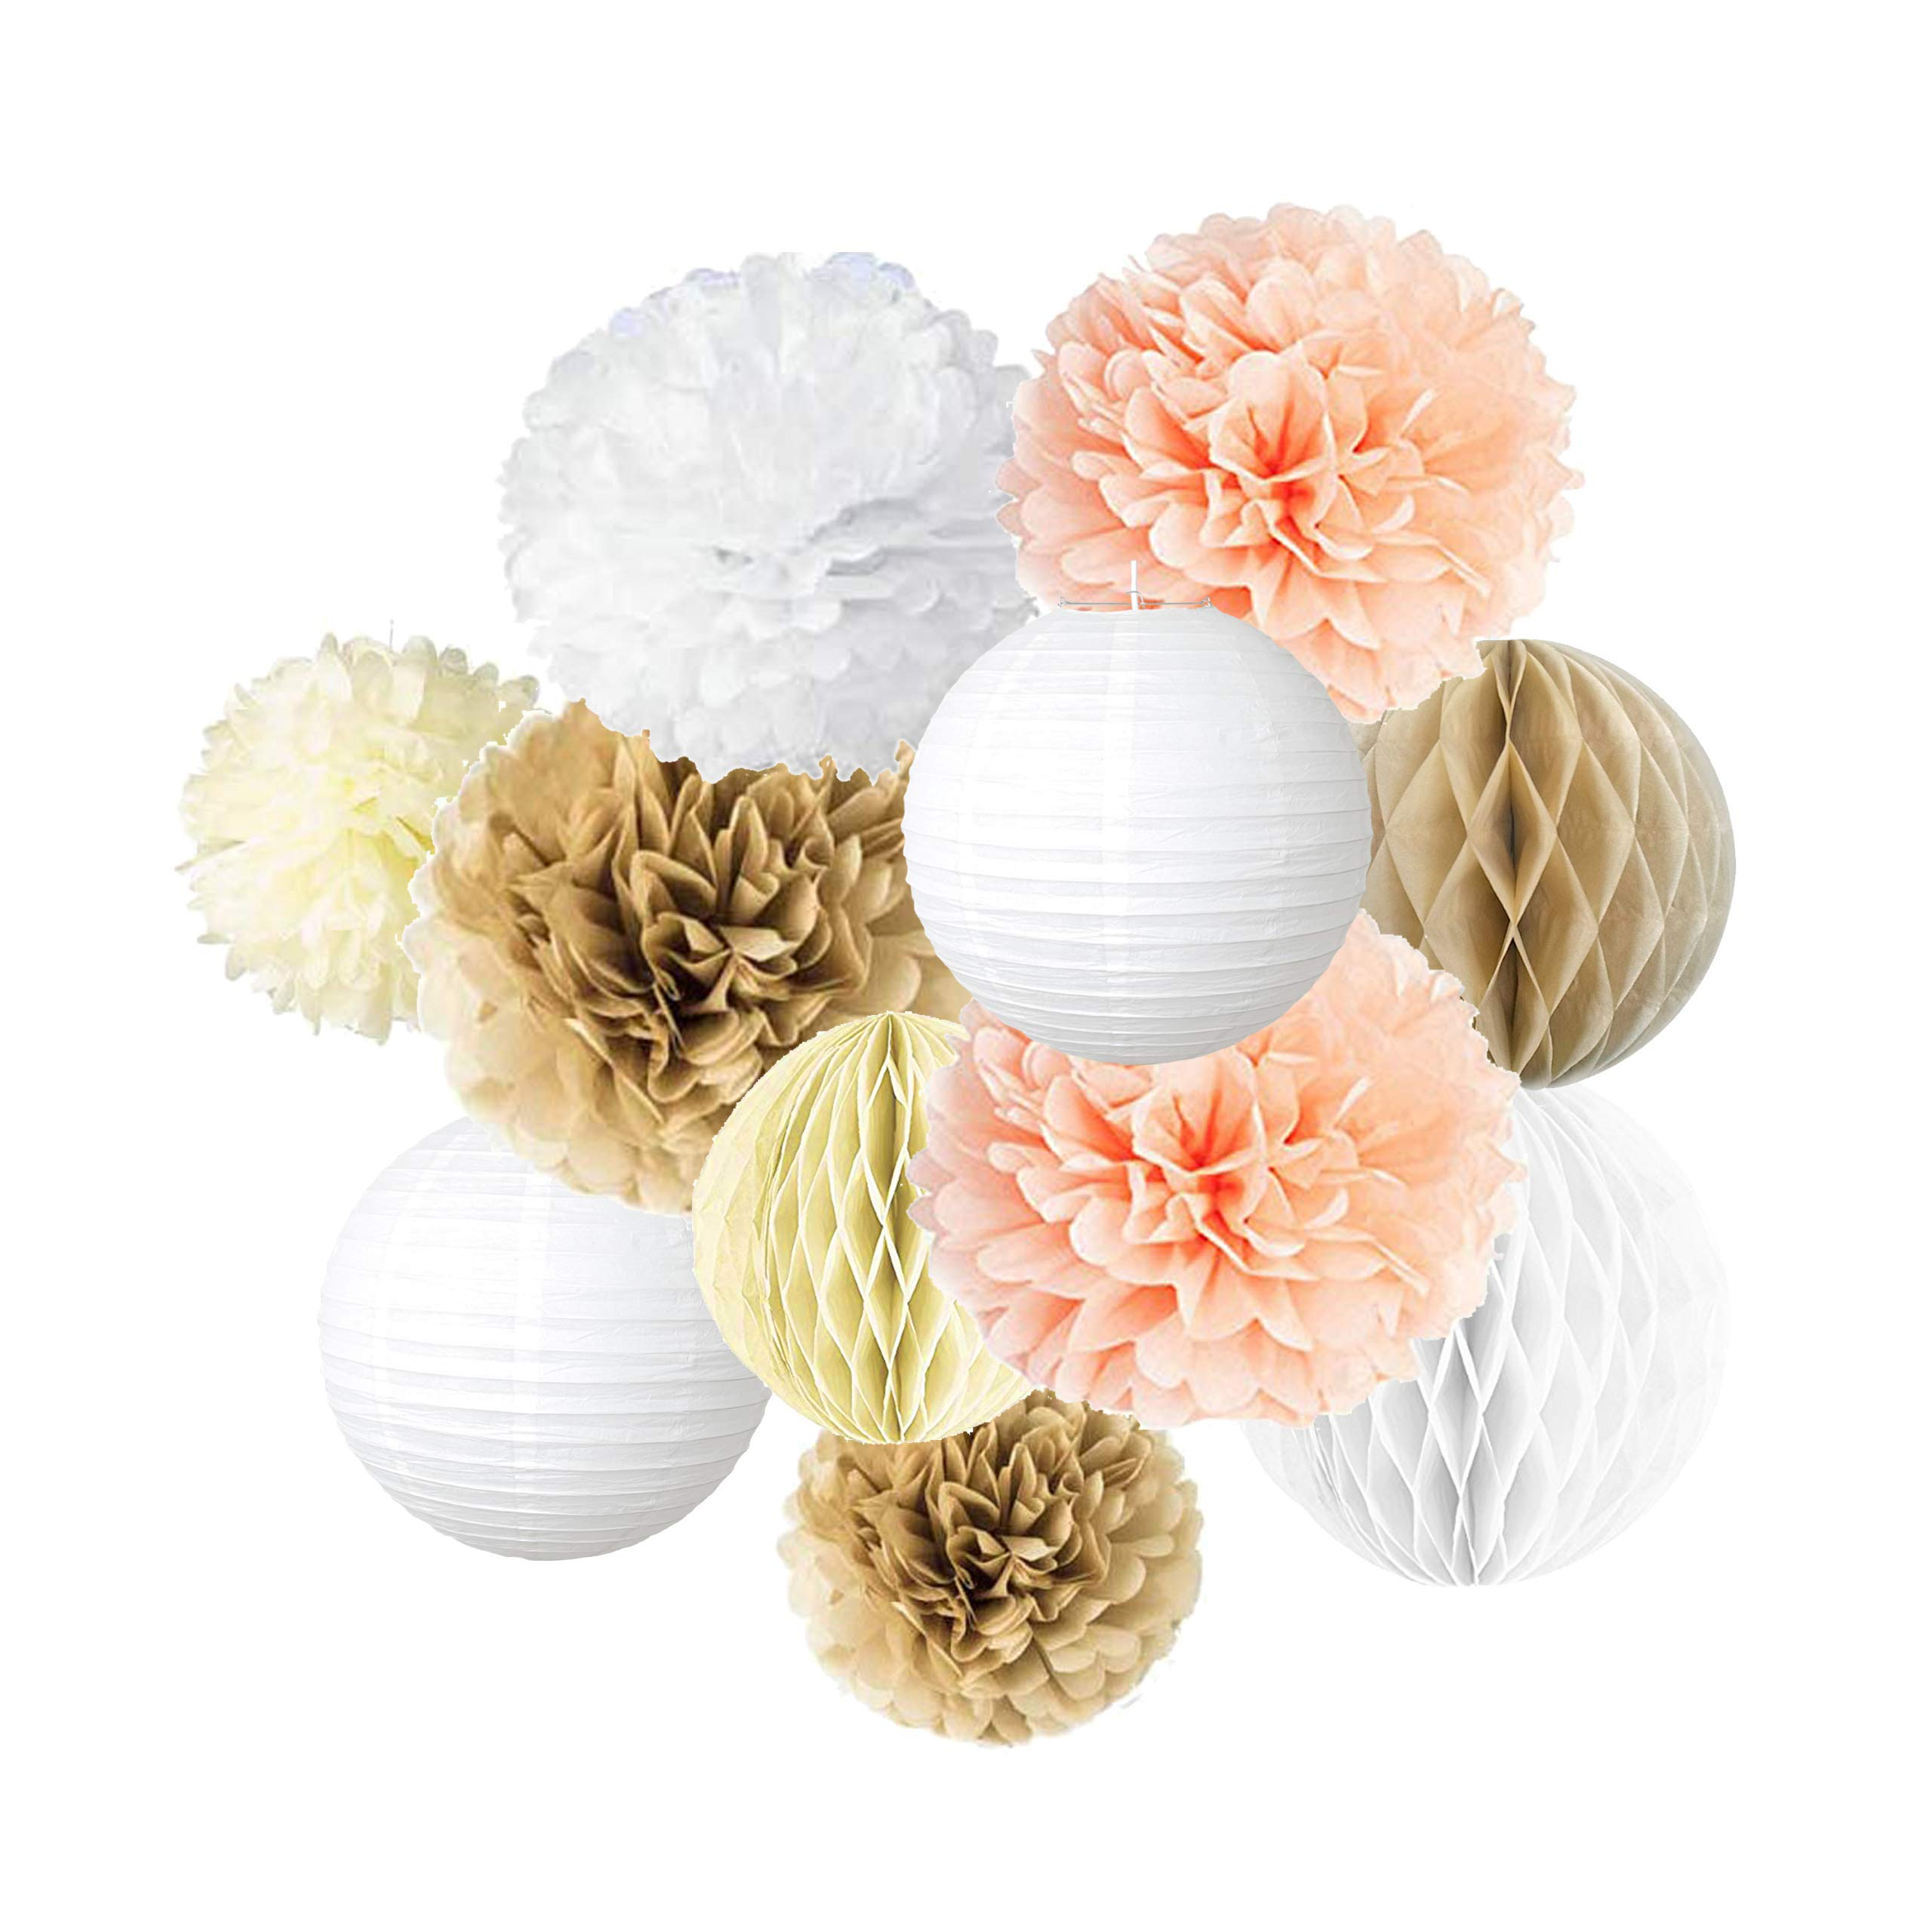 Pastel Grey 10 Tissue Paper Flowers for Wedding Bridal Shower Bachelorette Baby Shower Decor Vidal Crafts 20 PCS Dusty Pink Tissue Paper Pom Pom Kit Ivory 8 Birthday 6 14 Rose Gold